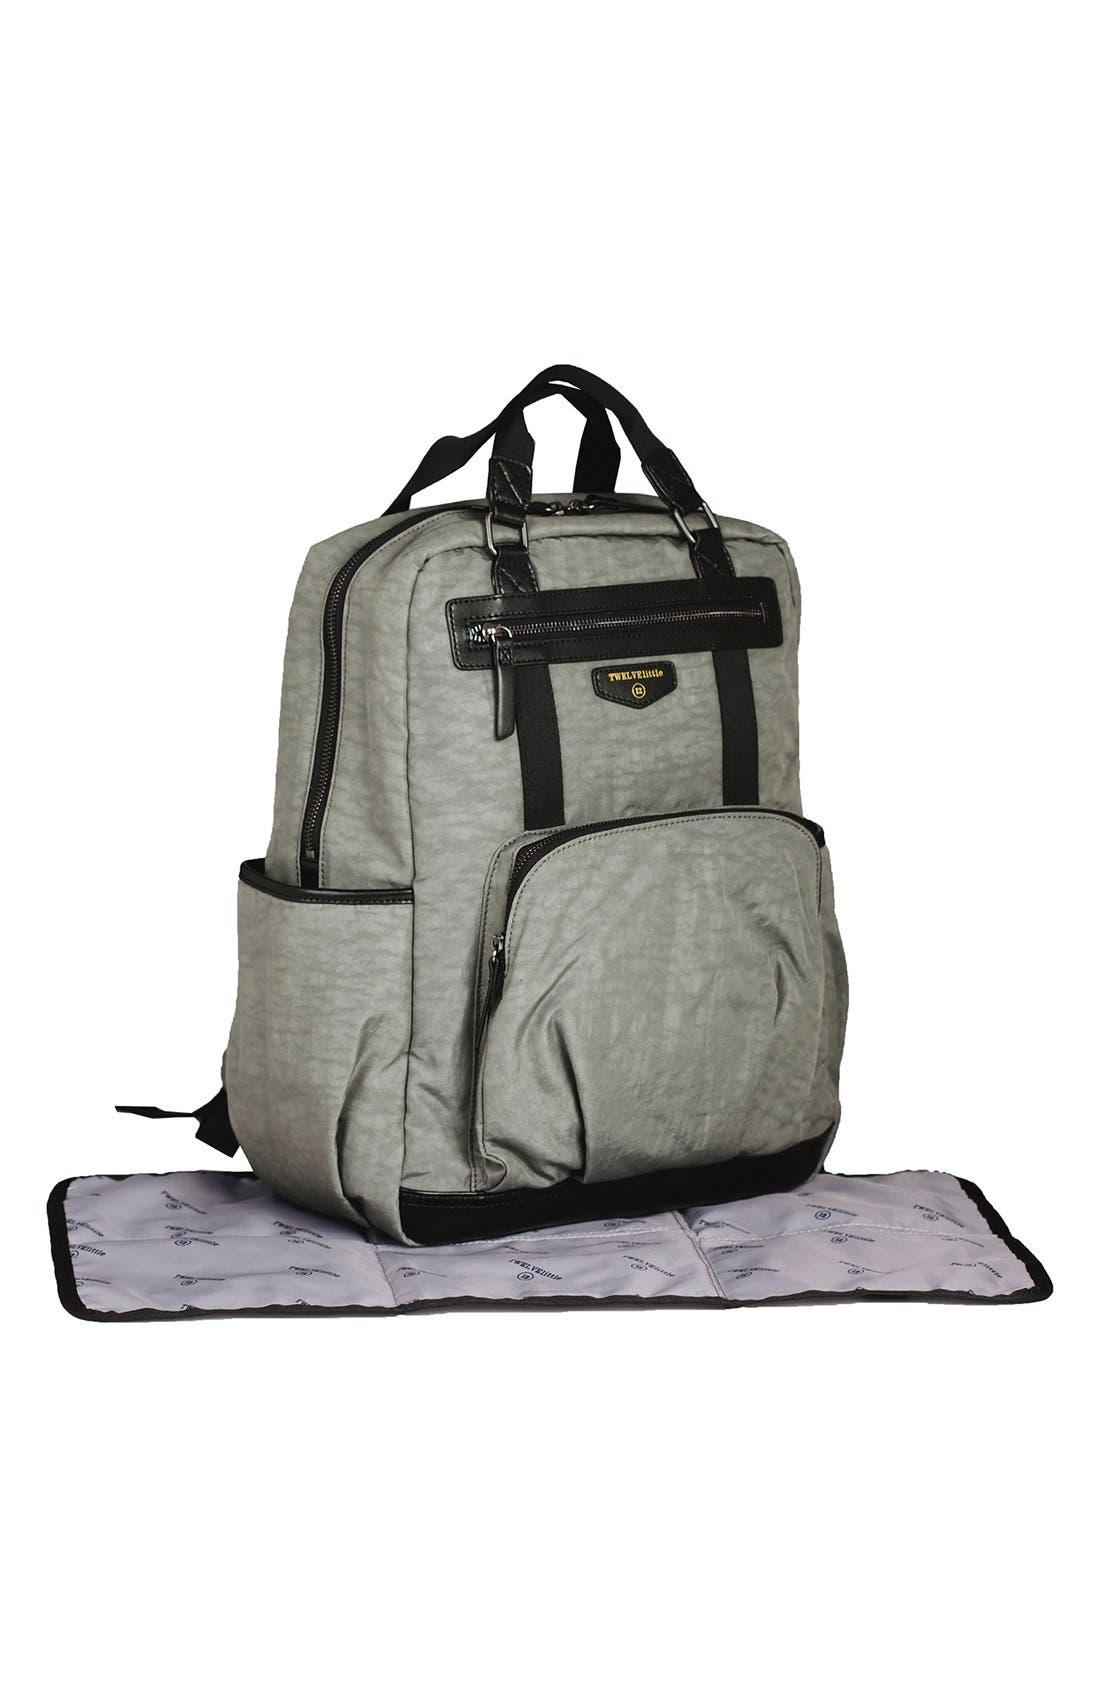 'Courage' Unisex Backpack Diaper Bag,                             Alternate thumbnail 8, color,                             DARK GREY